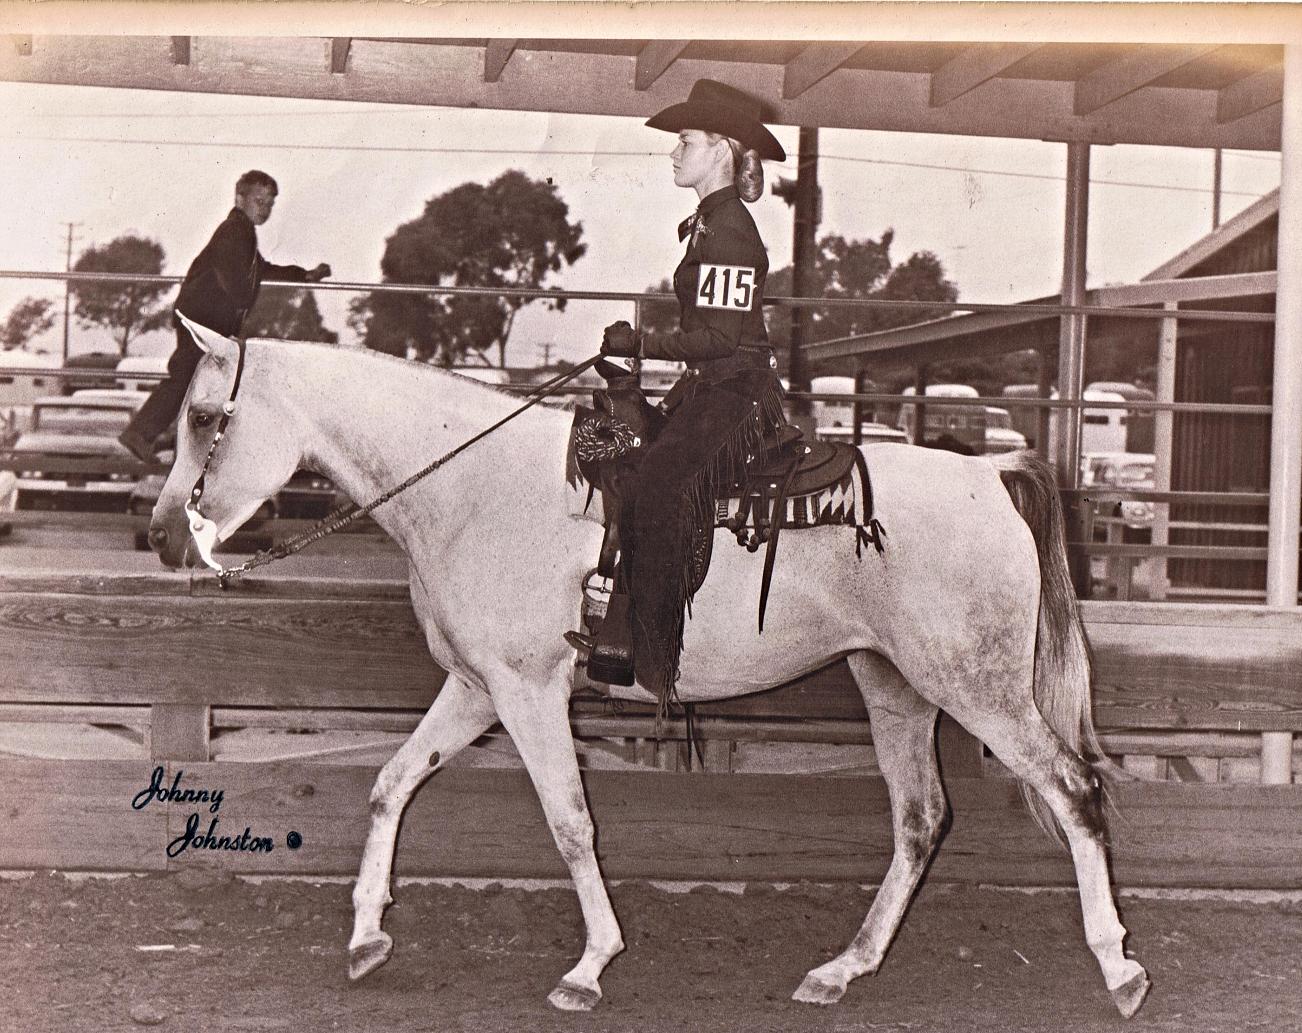 Tajura (Nadjur x Thearby) & Renee Cantrell 1969 Santa Barbara, CA (1)_edited